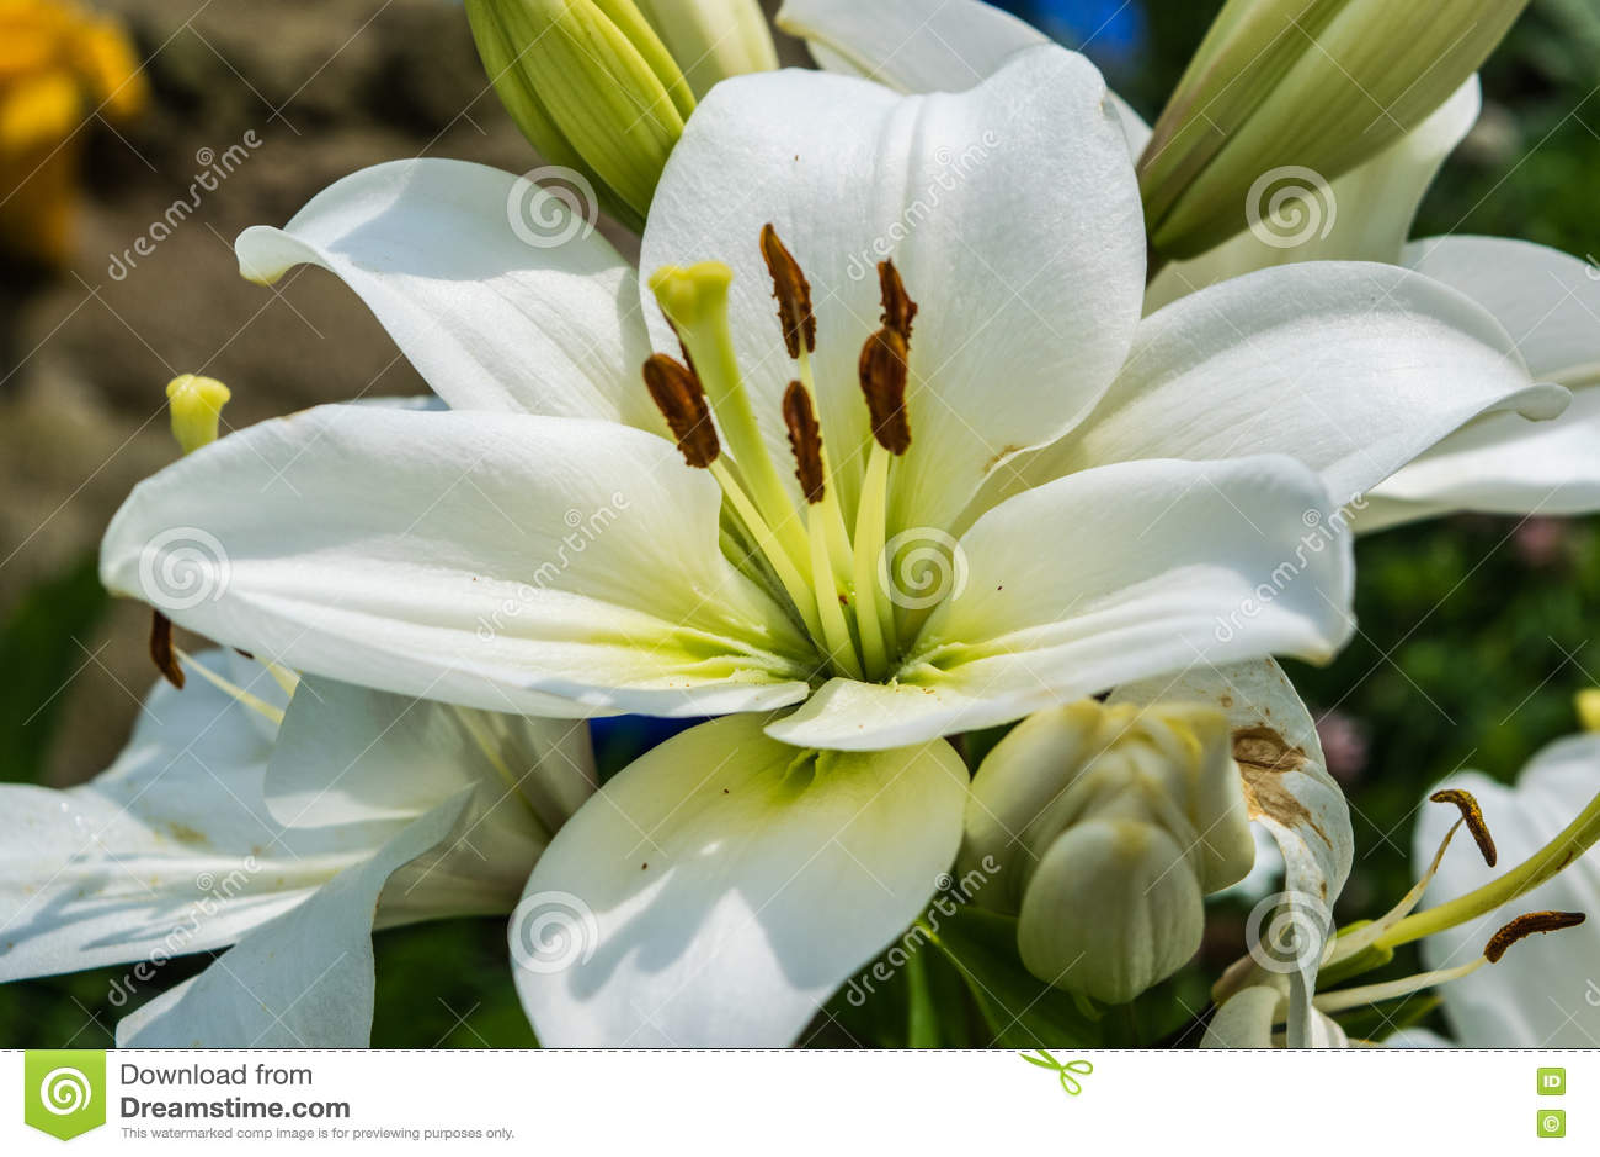 White madonna lily stock photo image of beautiful lily 77042562 royalty free stock photo izmirmasajfo